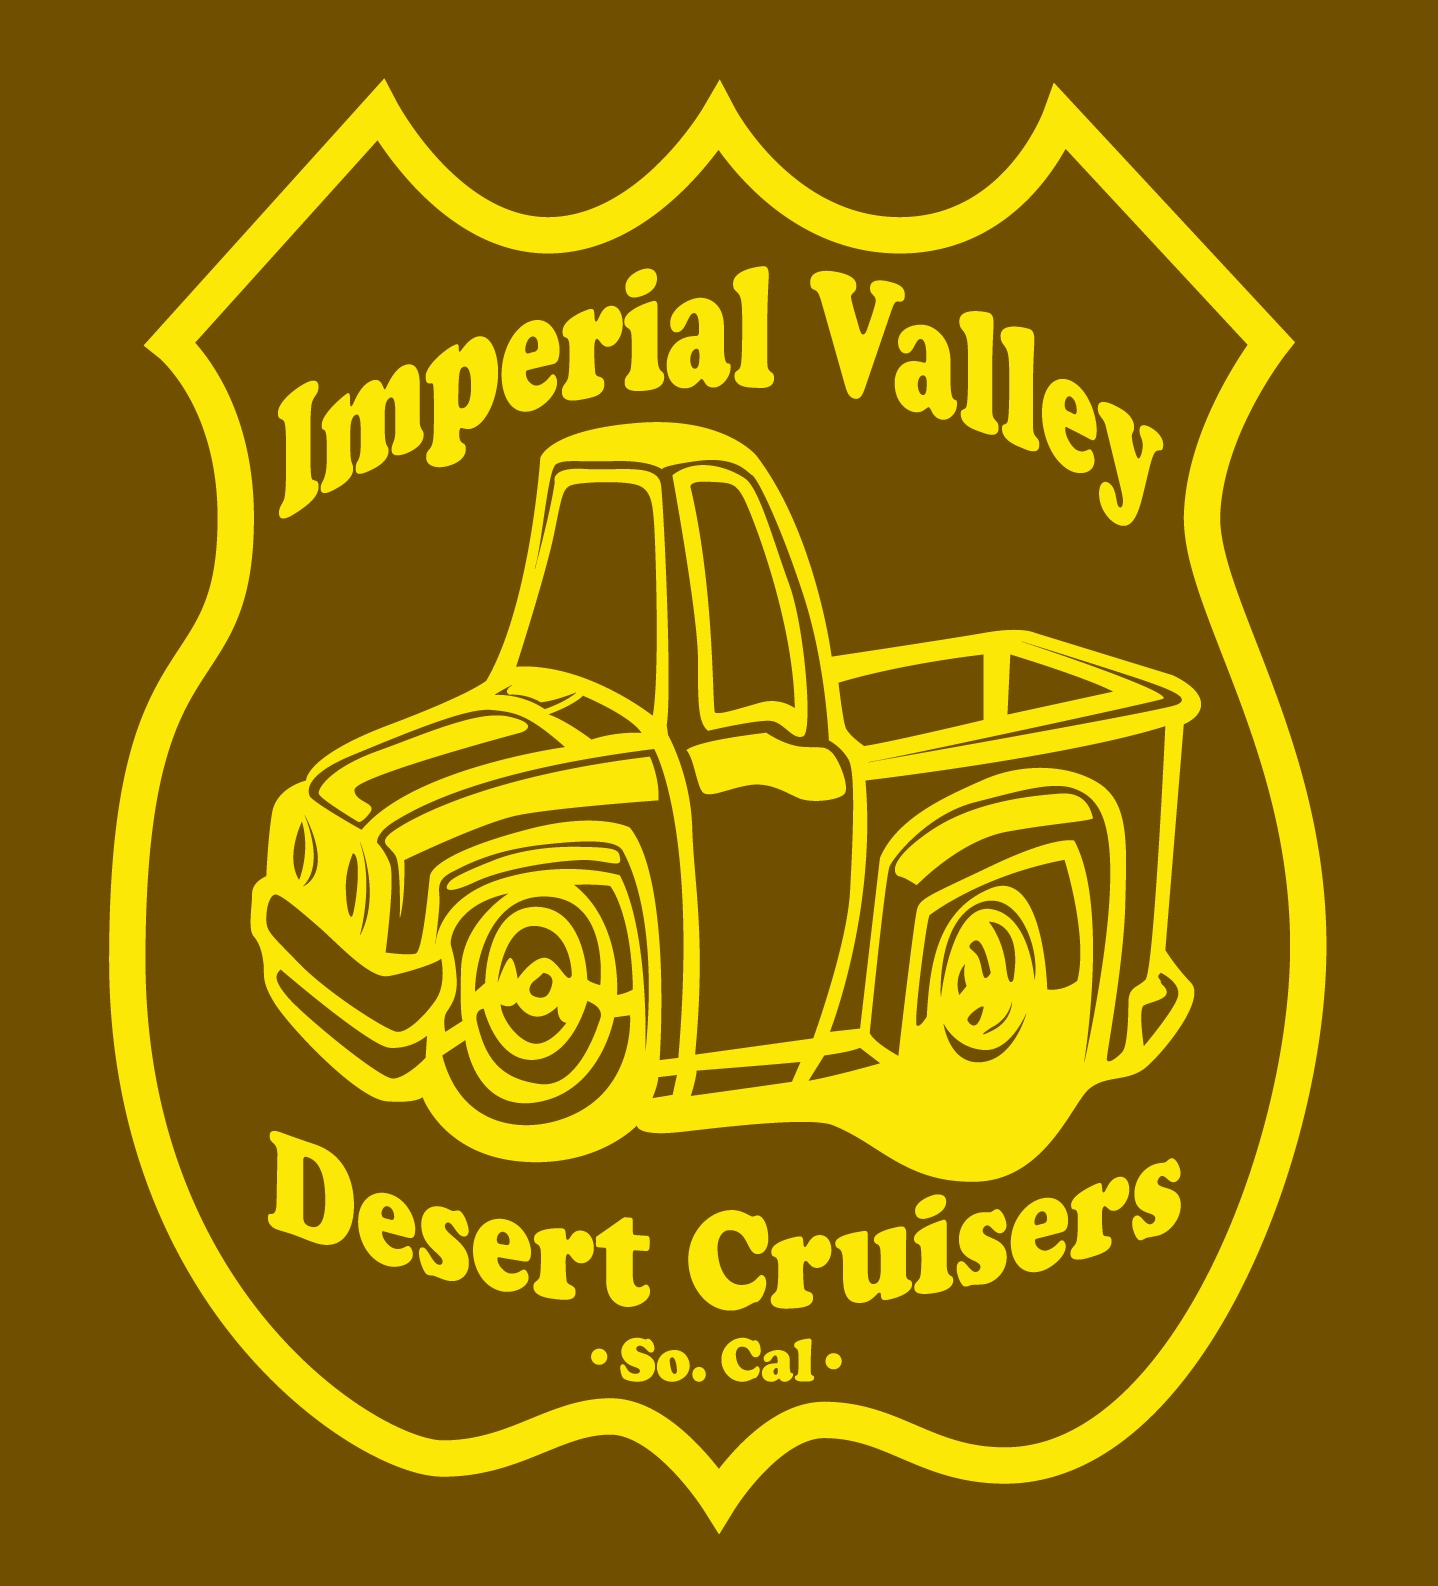 Design car club logo - Ralph Vargas Formed This Car Club Of Friends